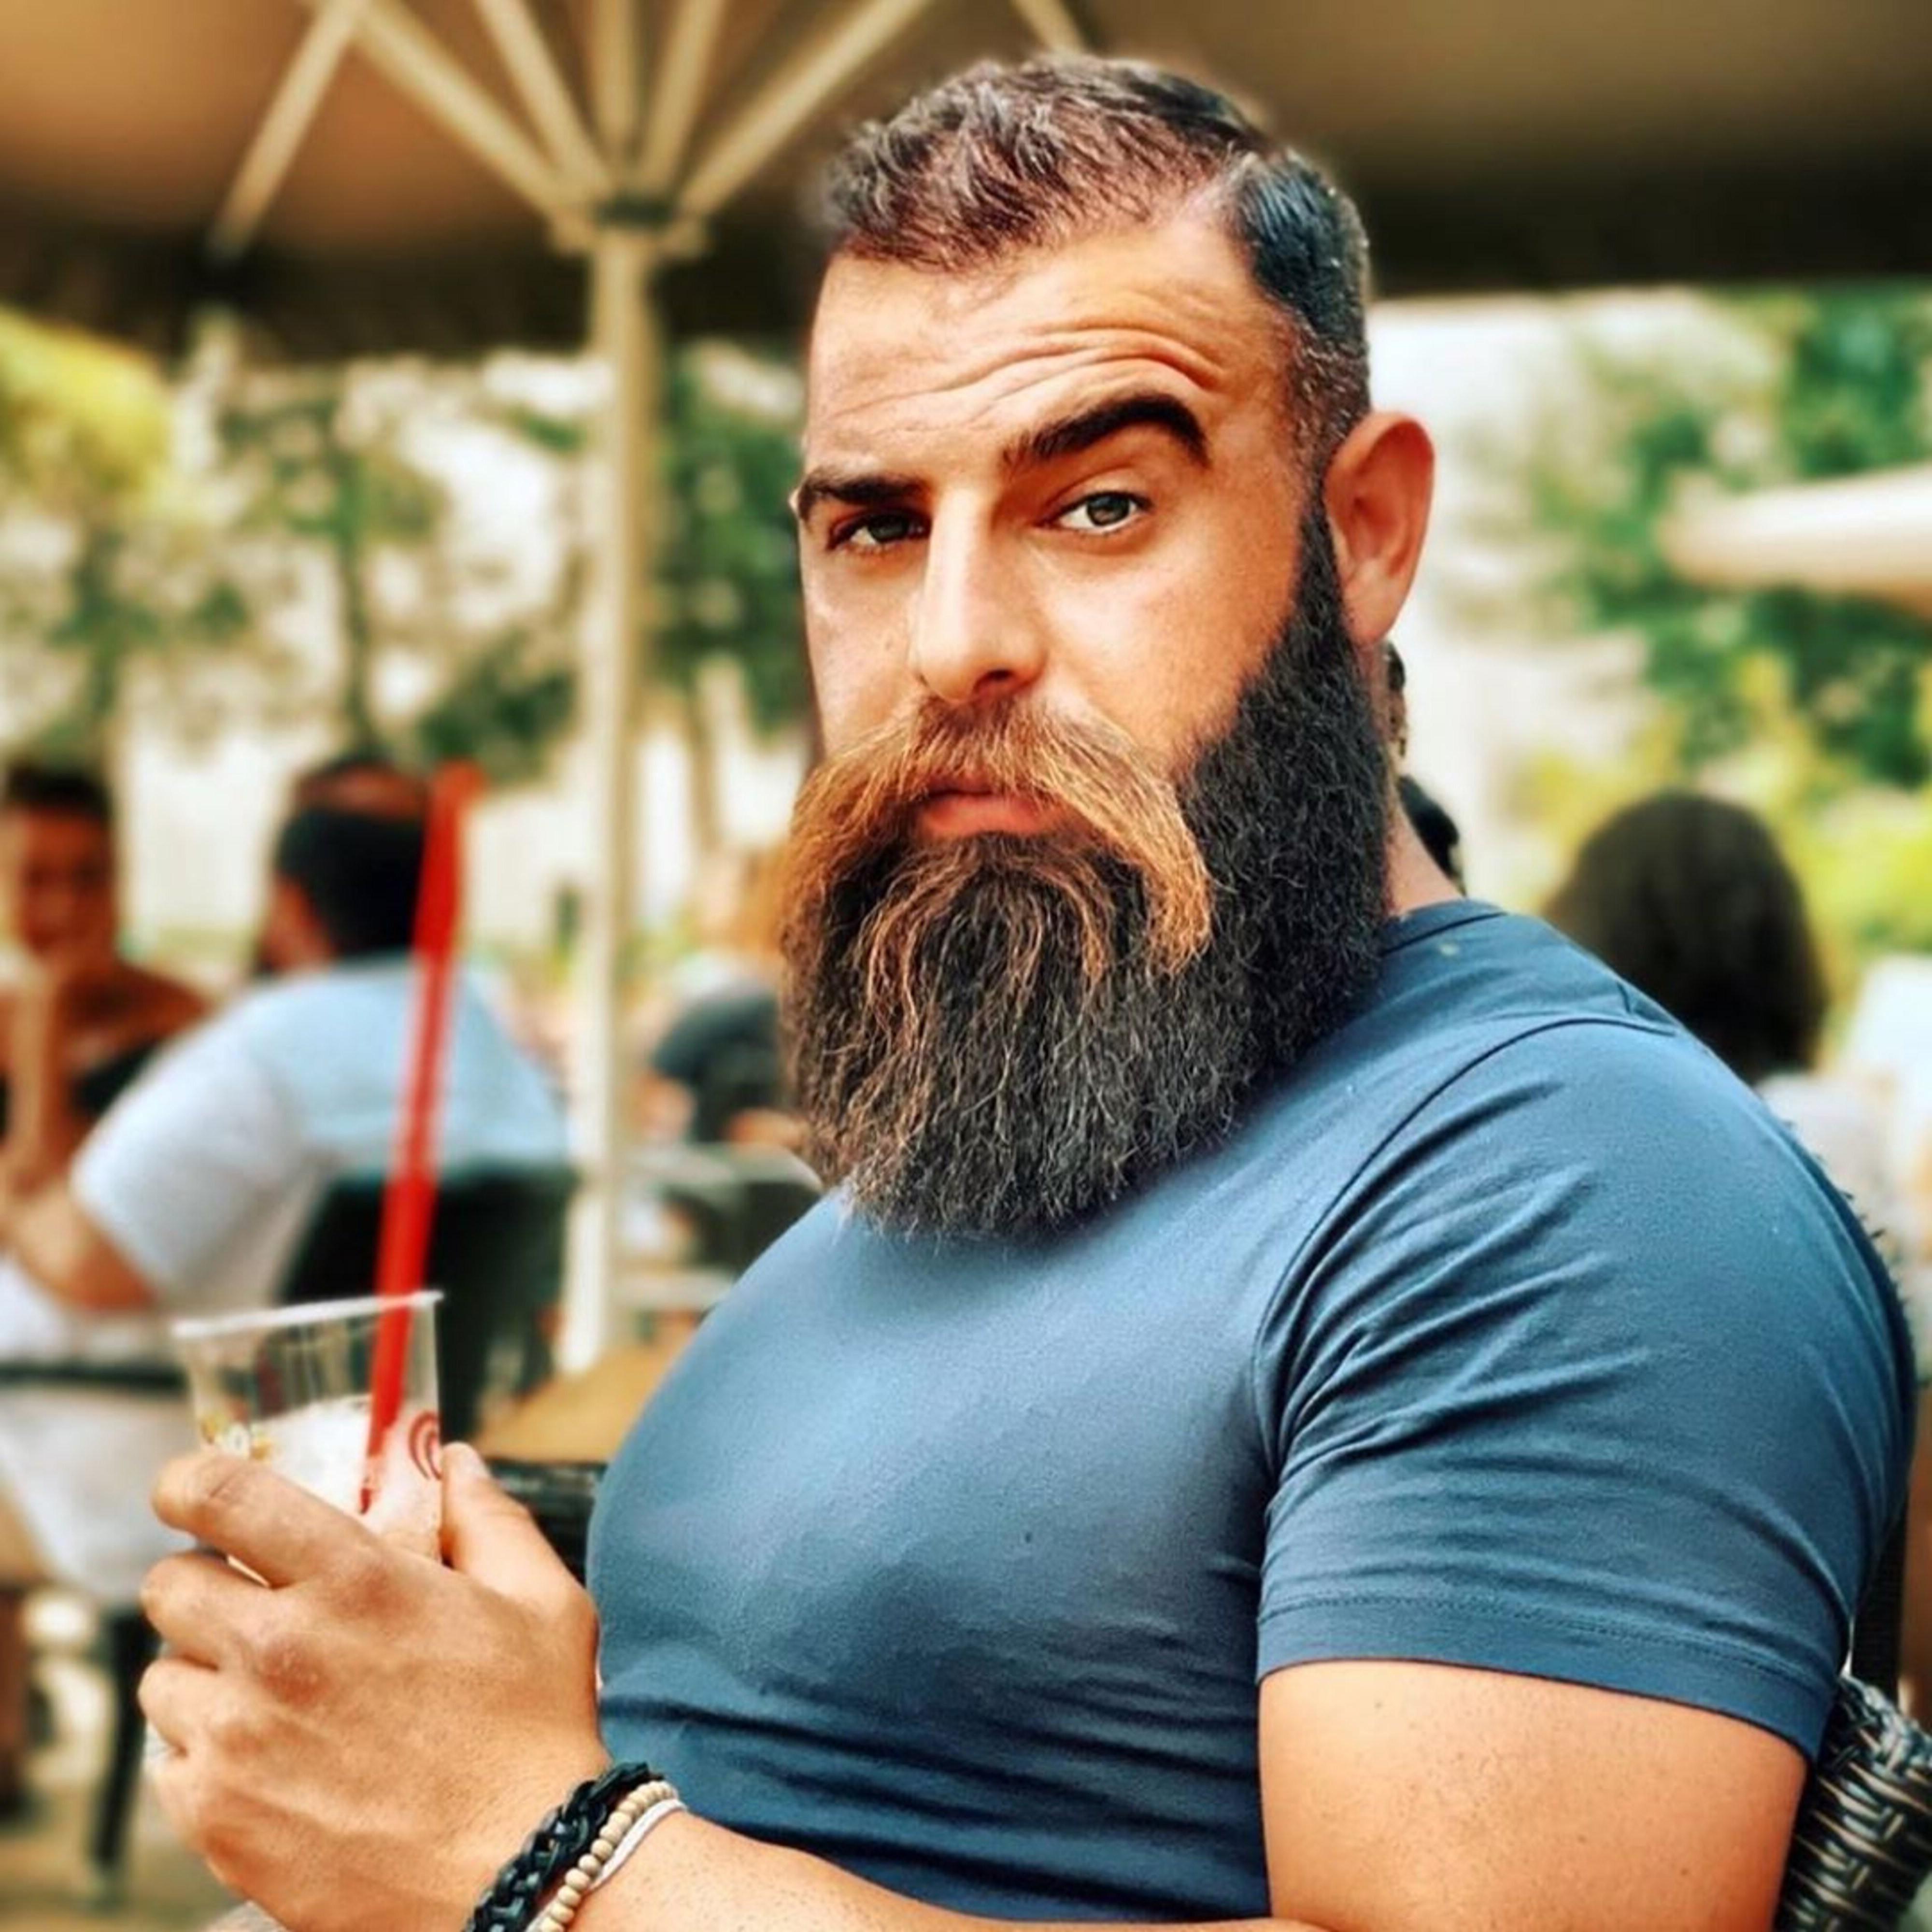 A long scraggly beard for cool men.